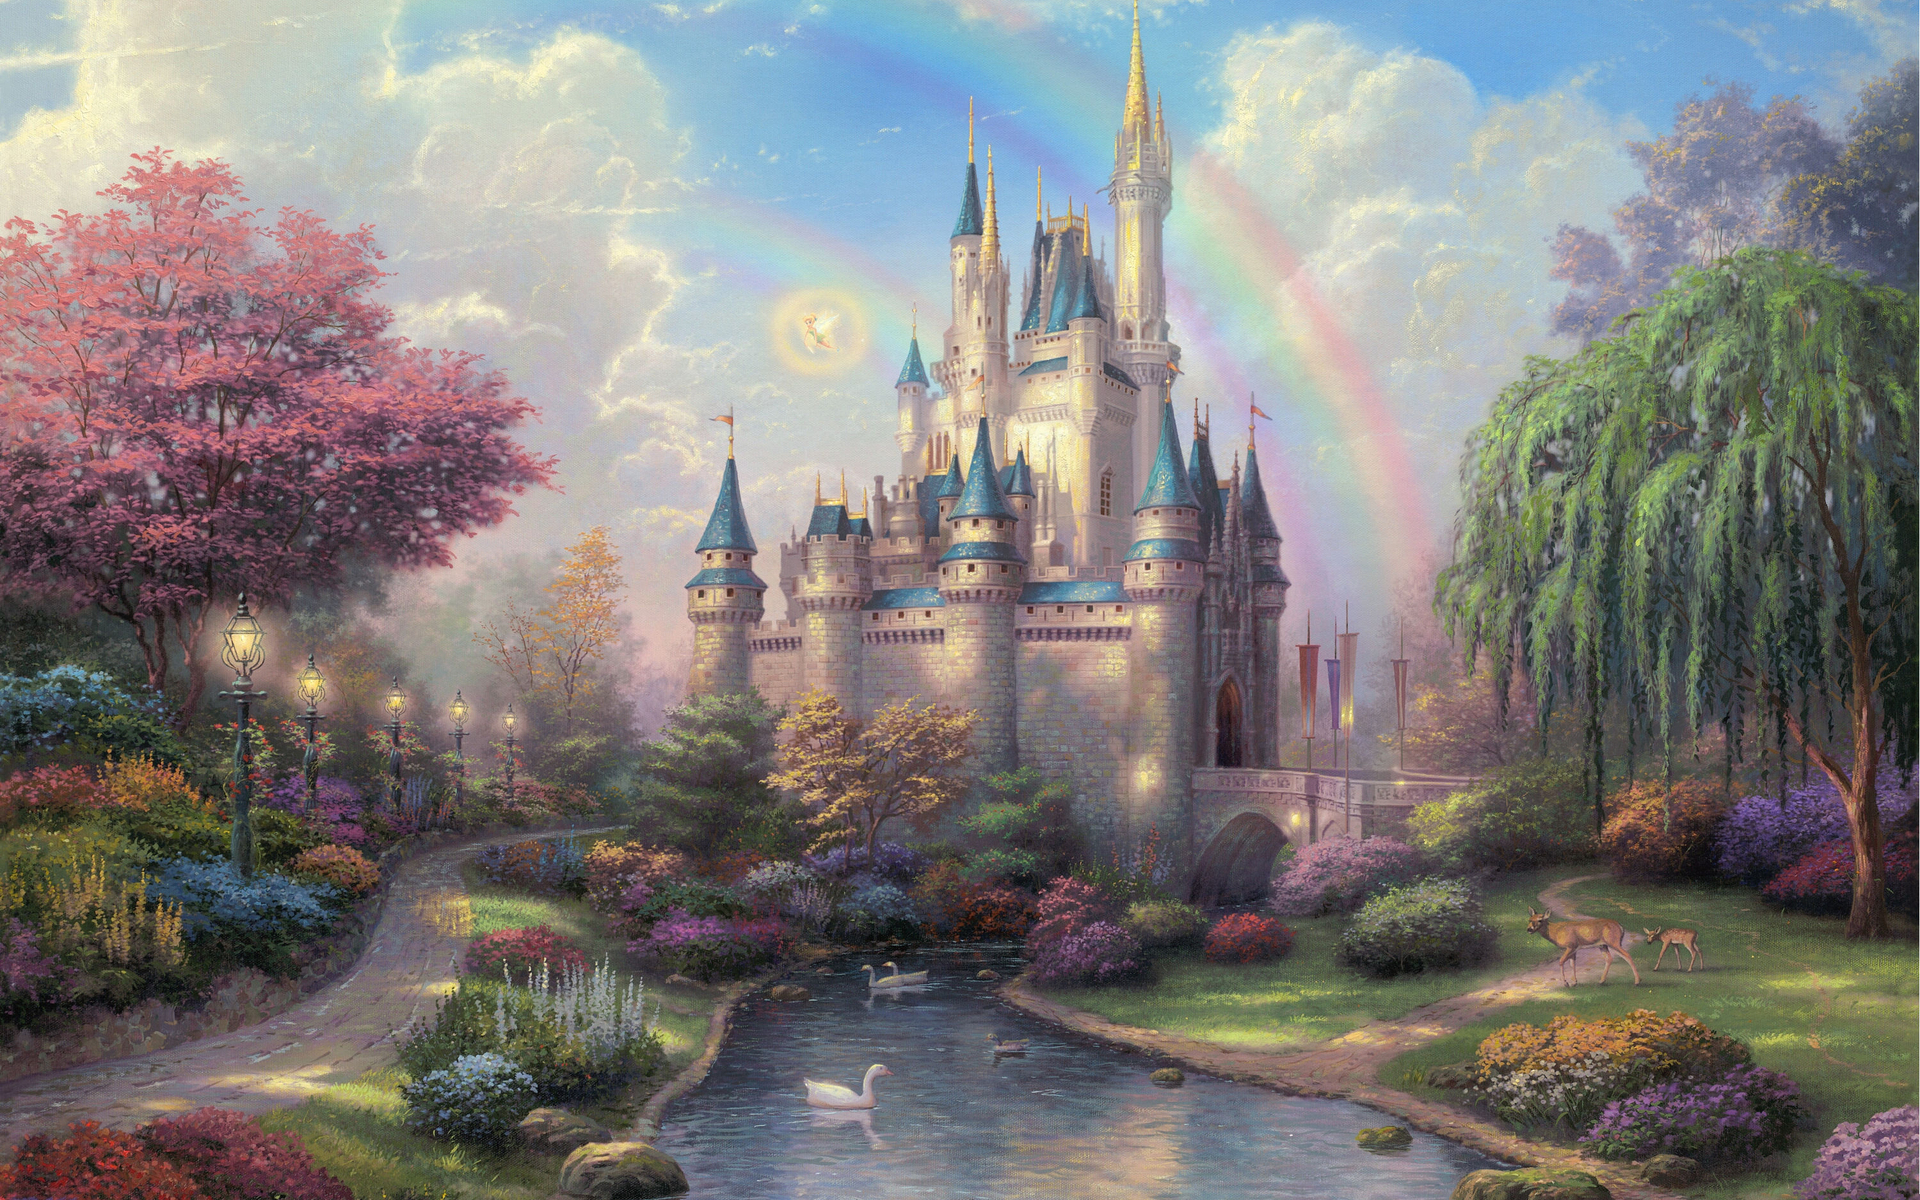 hdwallpapersdesktopcomThomas Kinkade Disneyland 1920x1200